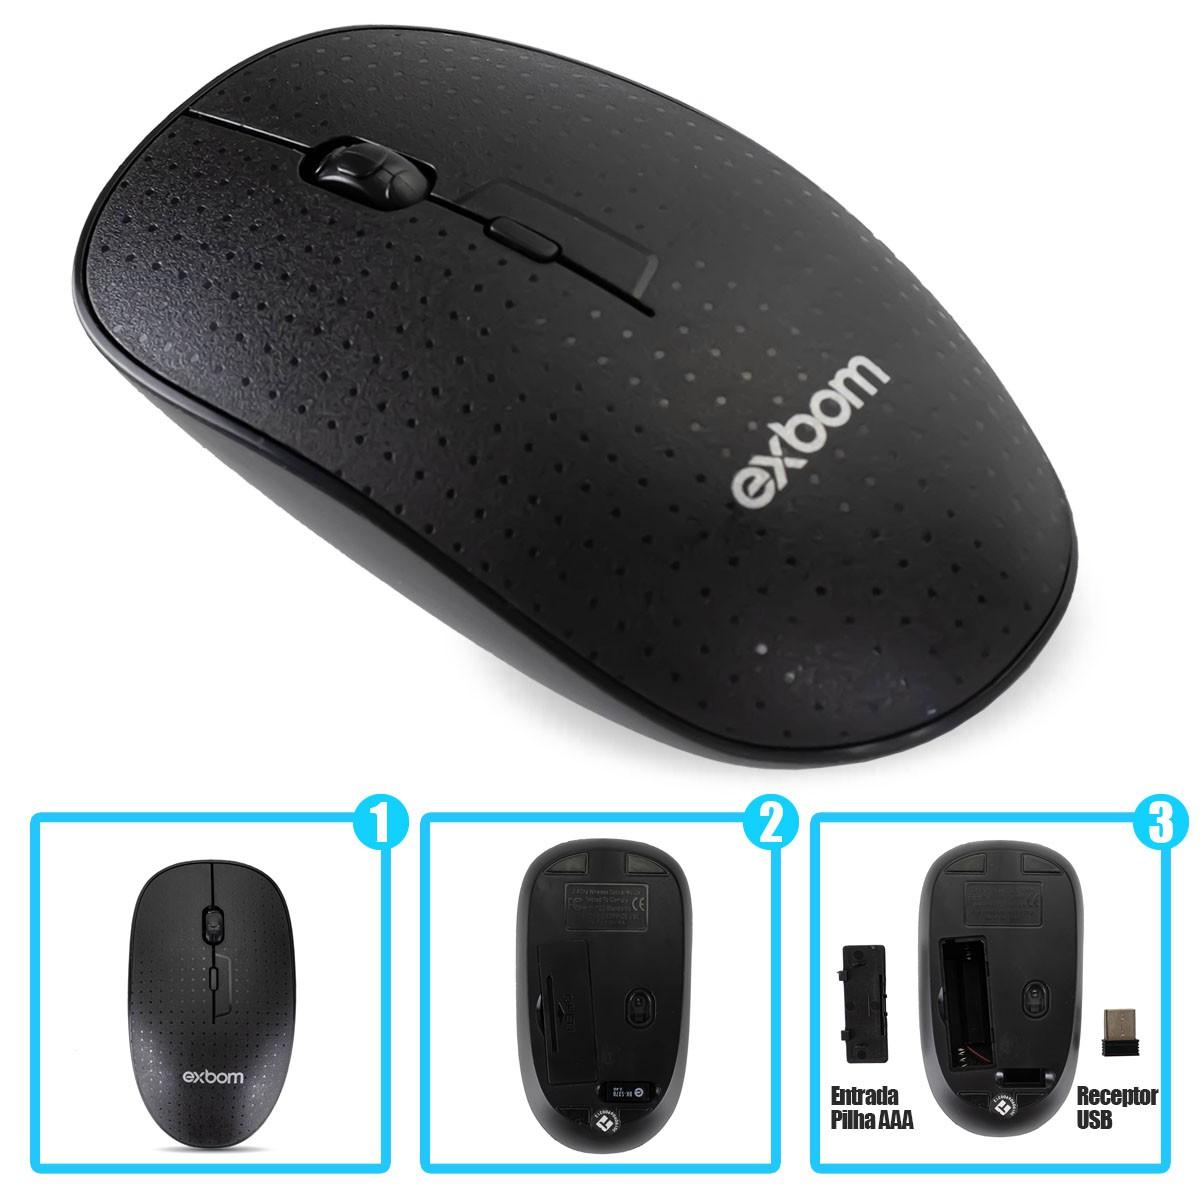 Kit Teclado e Mouse Sem Fio 2.4GHz USB ABNT 2 (Com Ç) 107 Teclas Exbom BK-S370